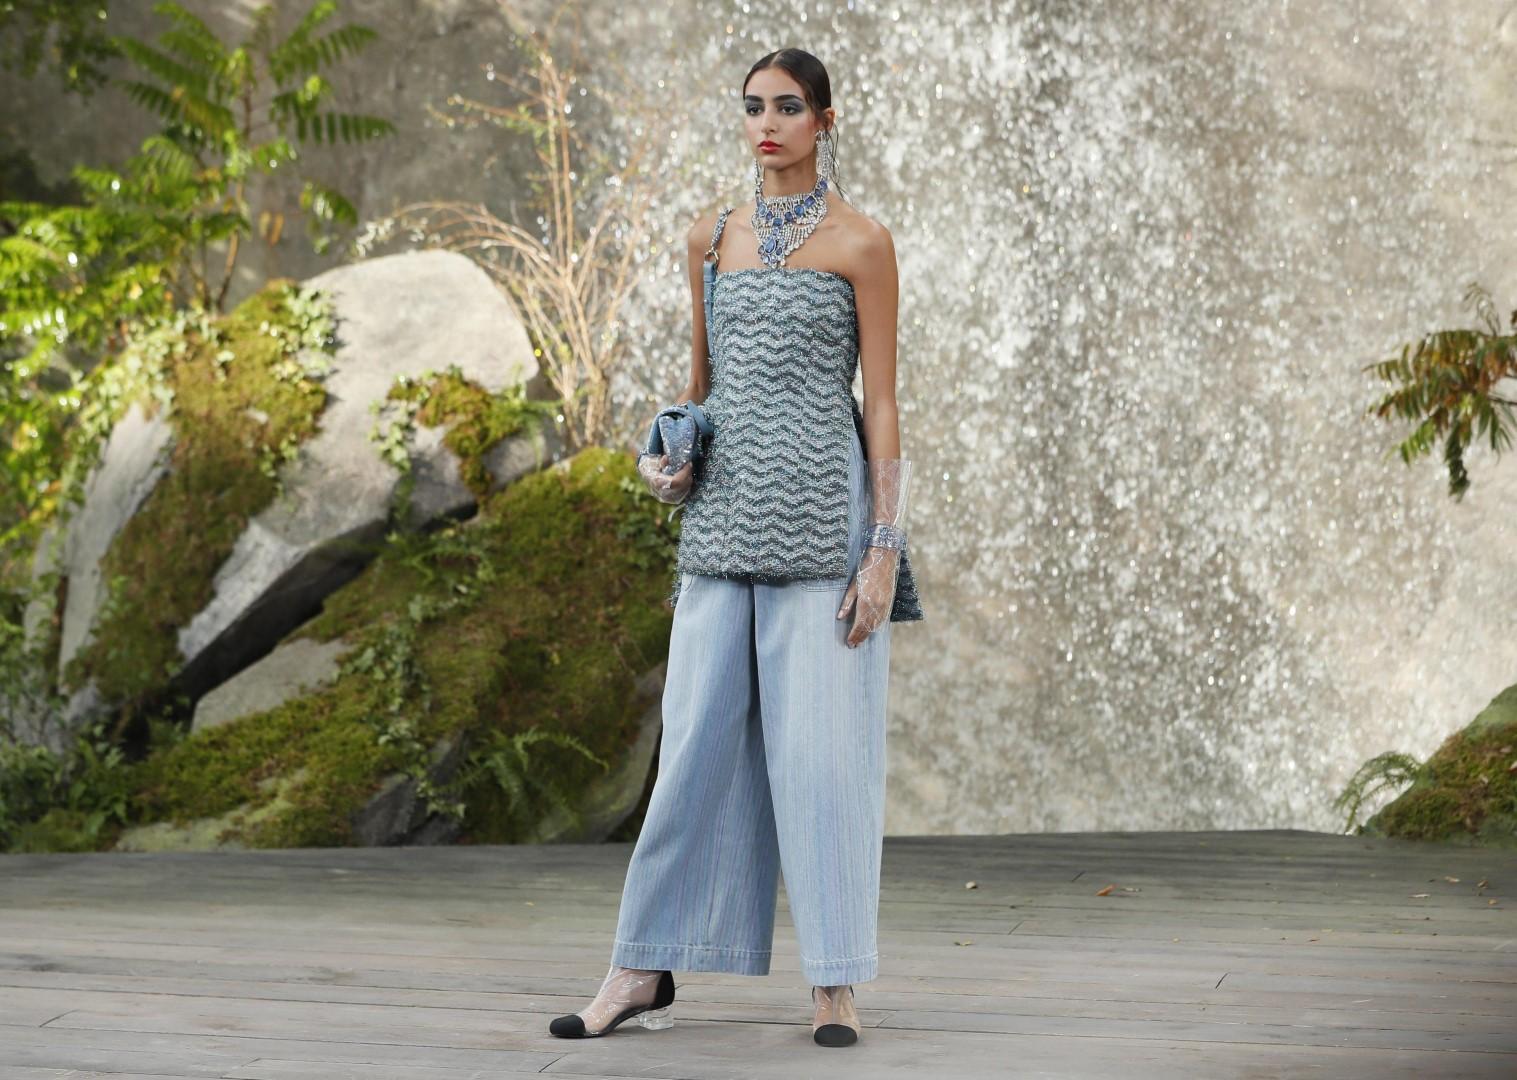 Jeans: i modelli di tendenza